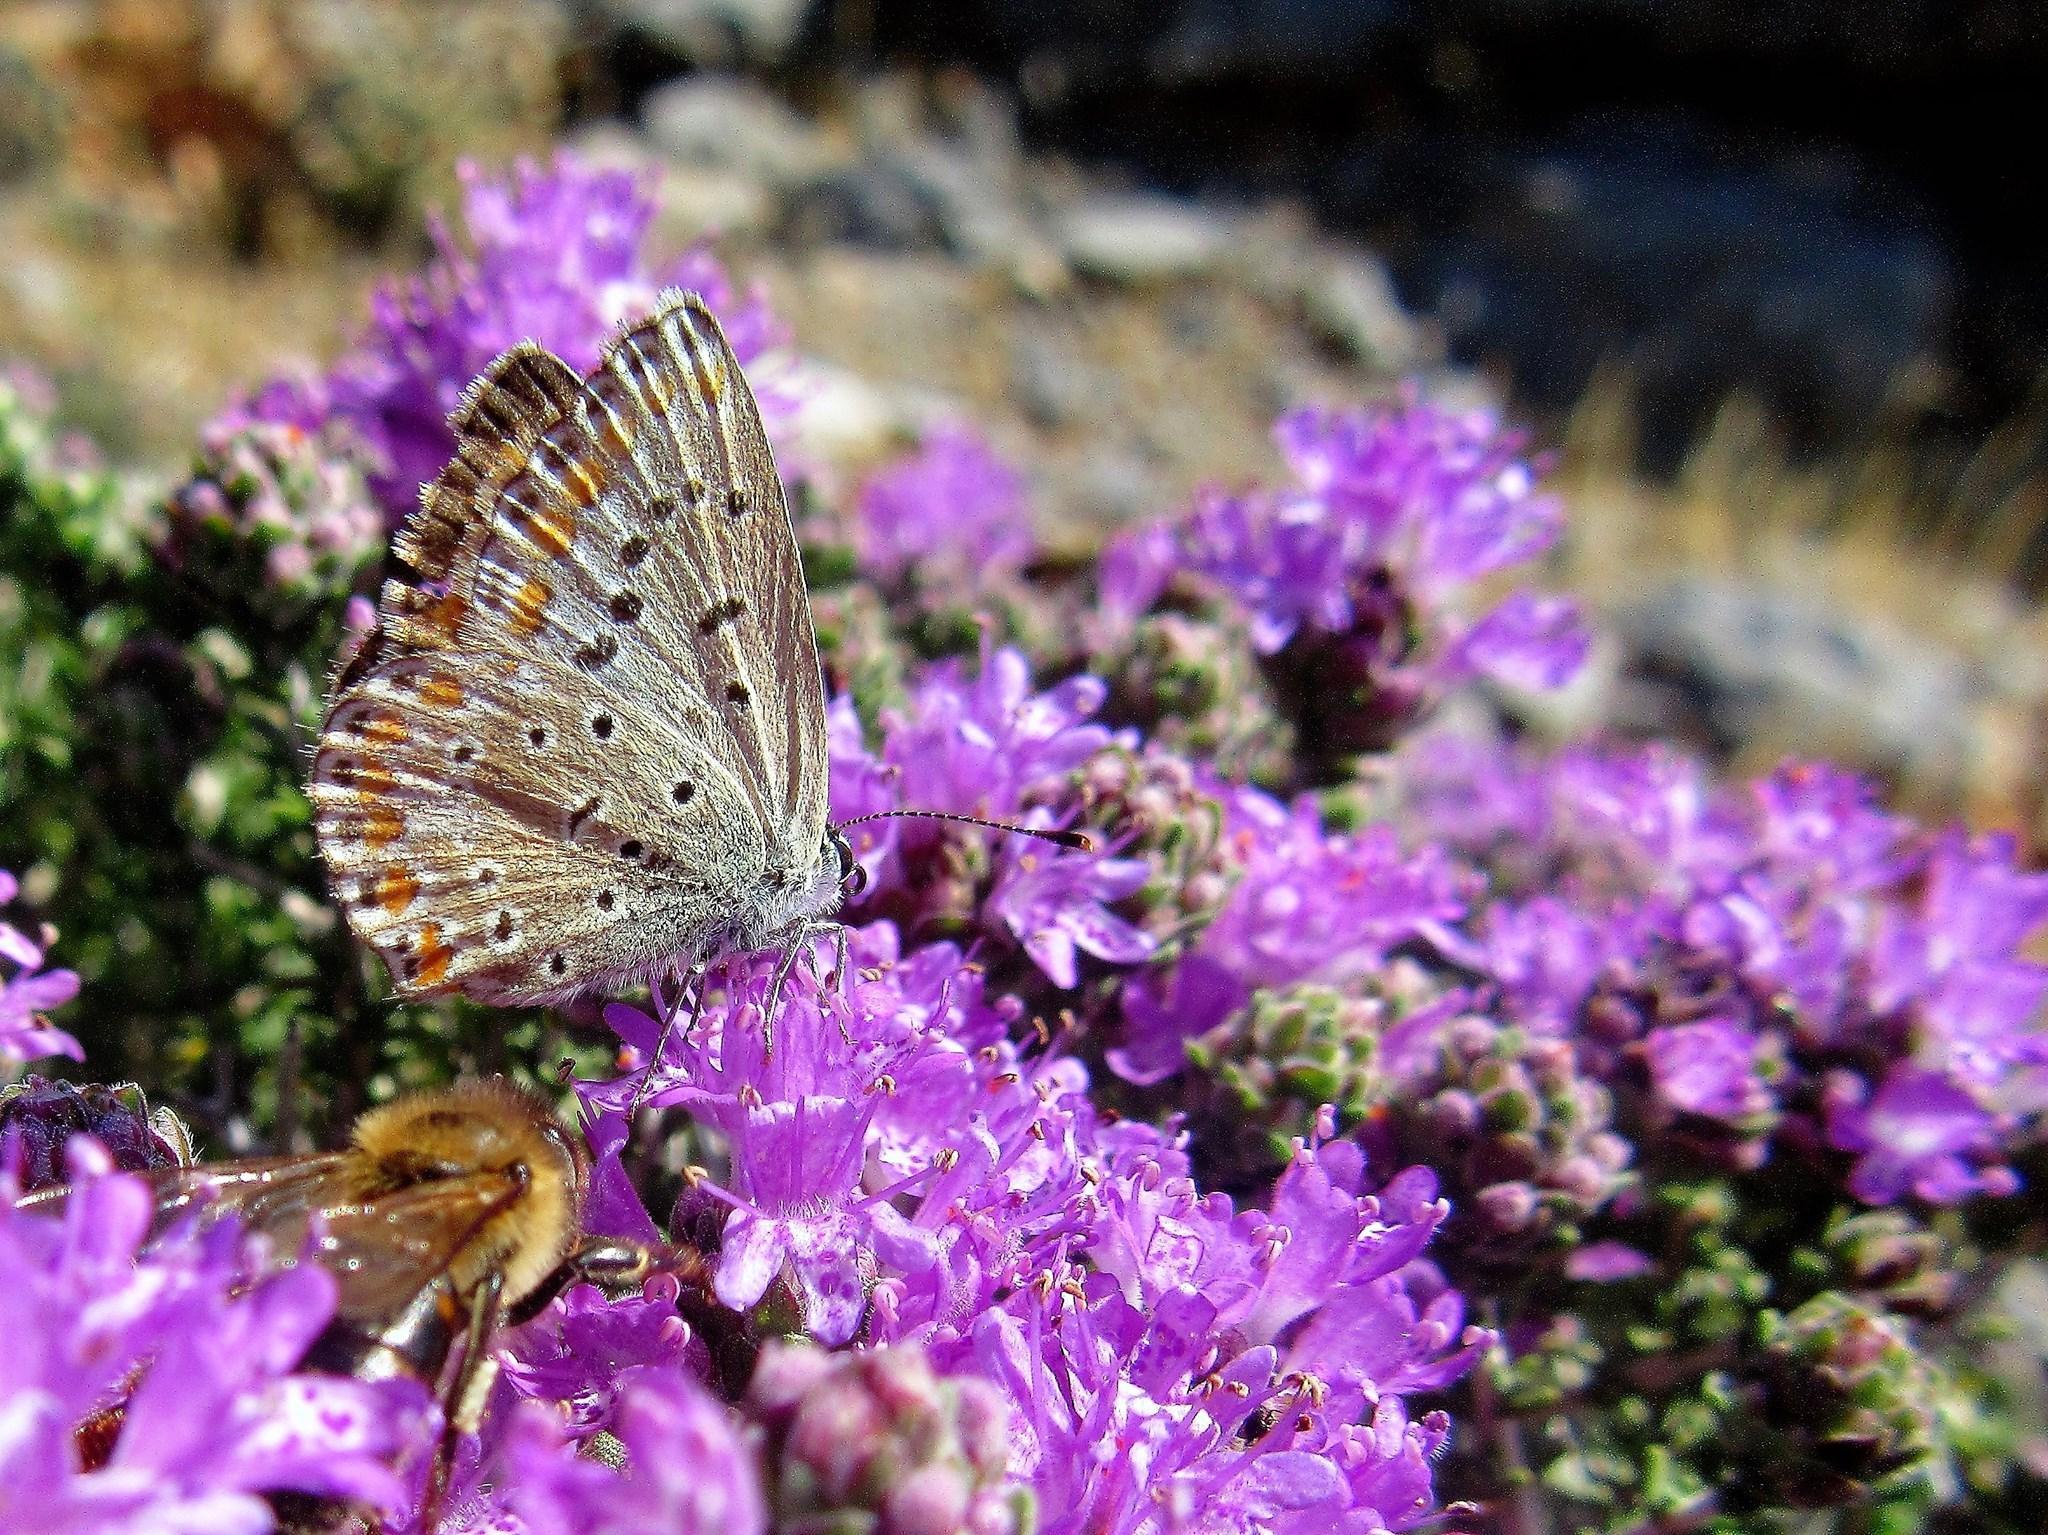 Plant Walk - A Sense of Herbal Summer